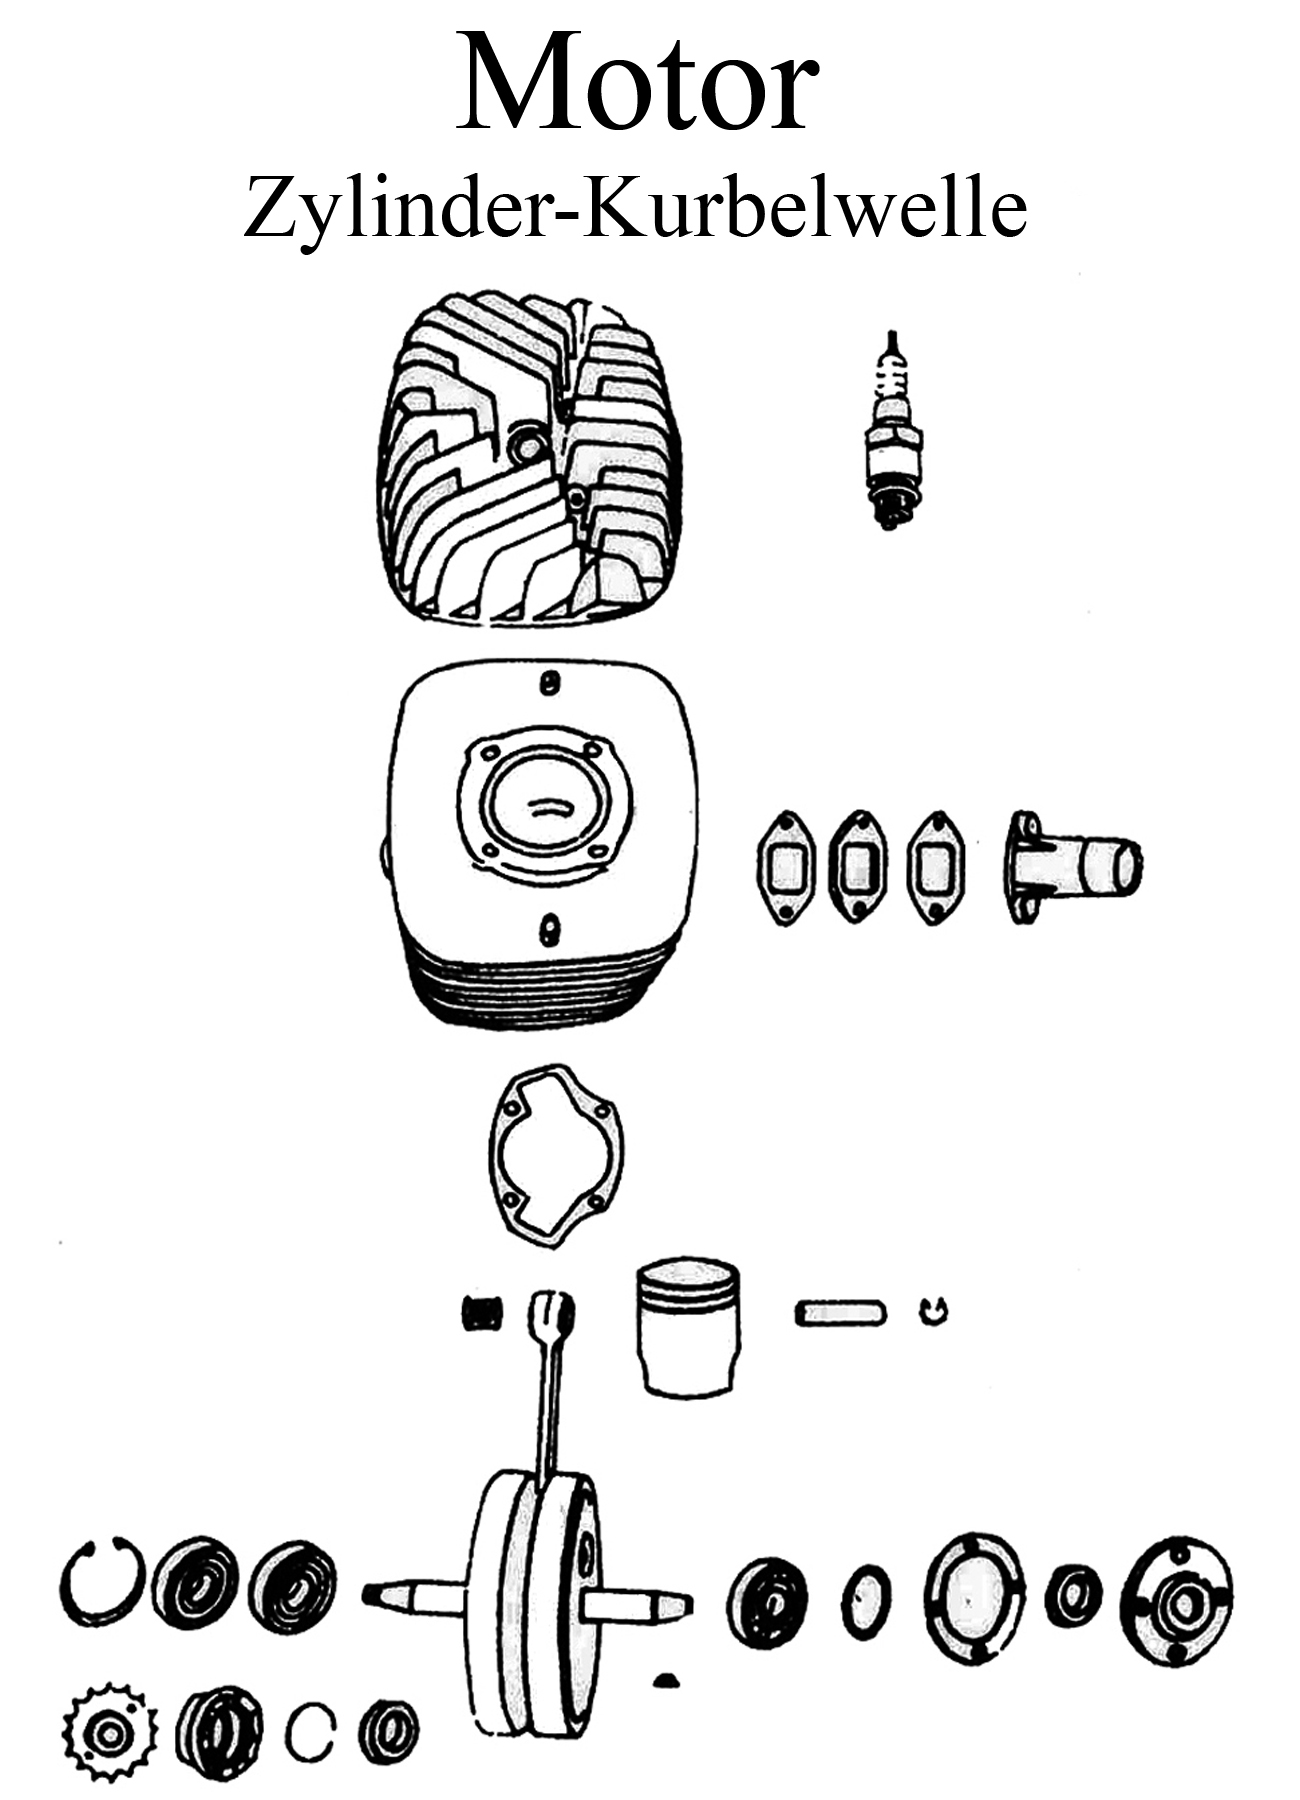 DDR Motorrad MZ TS 125 150 Ersatzteile Motor Zylinder Kurbelwelle